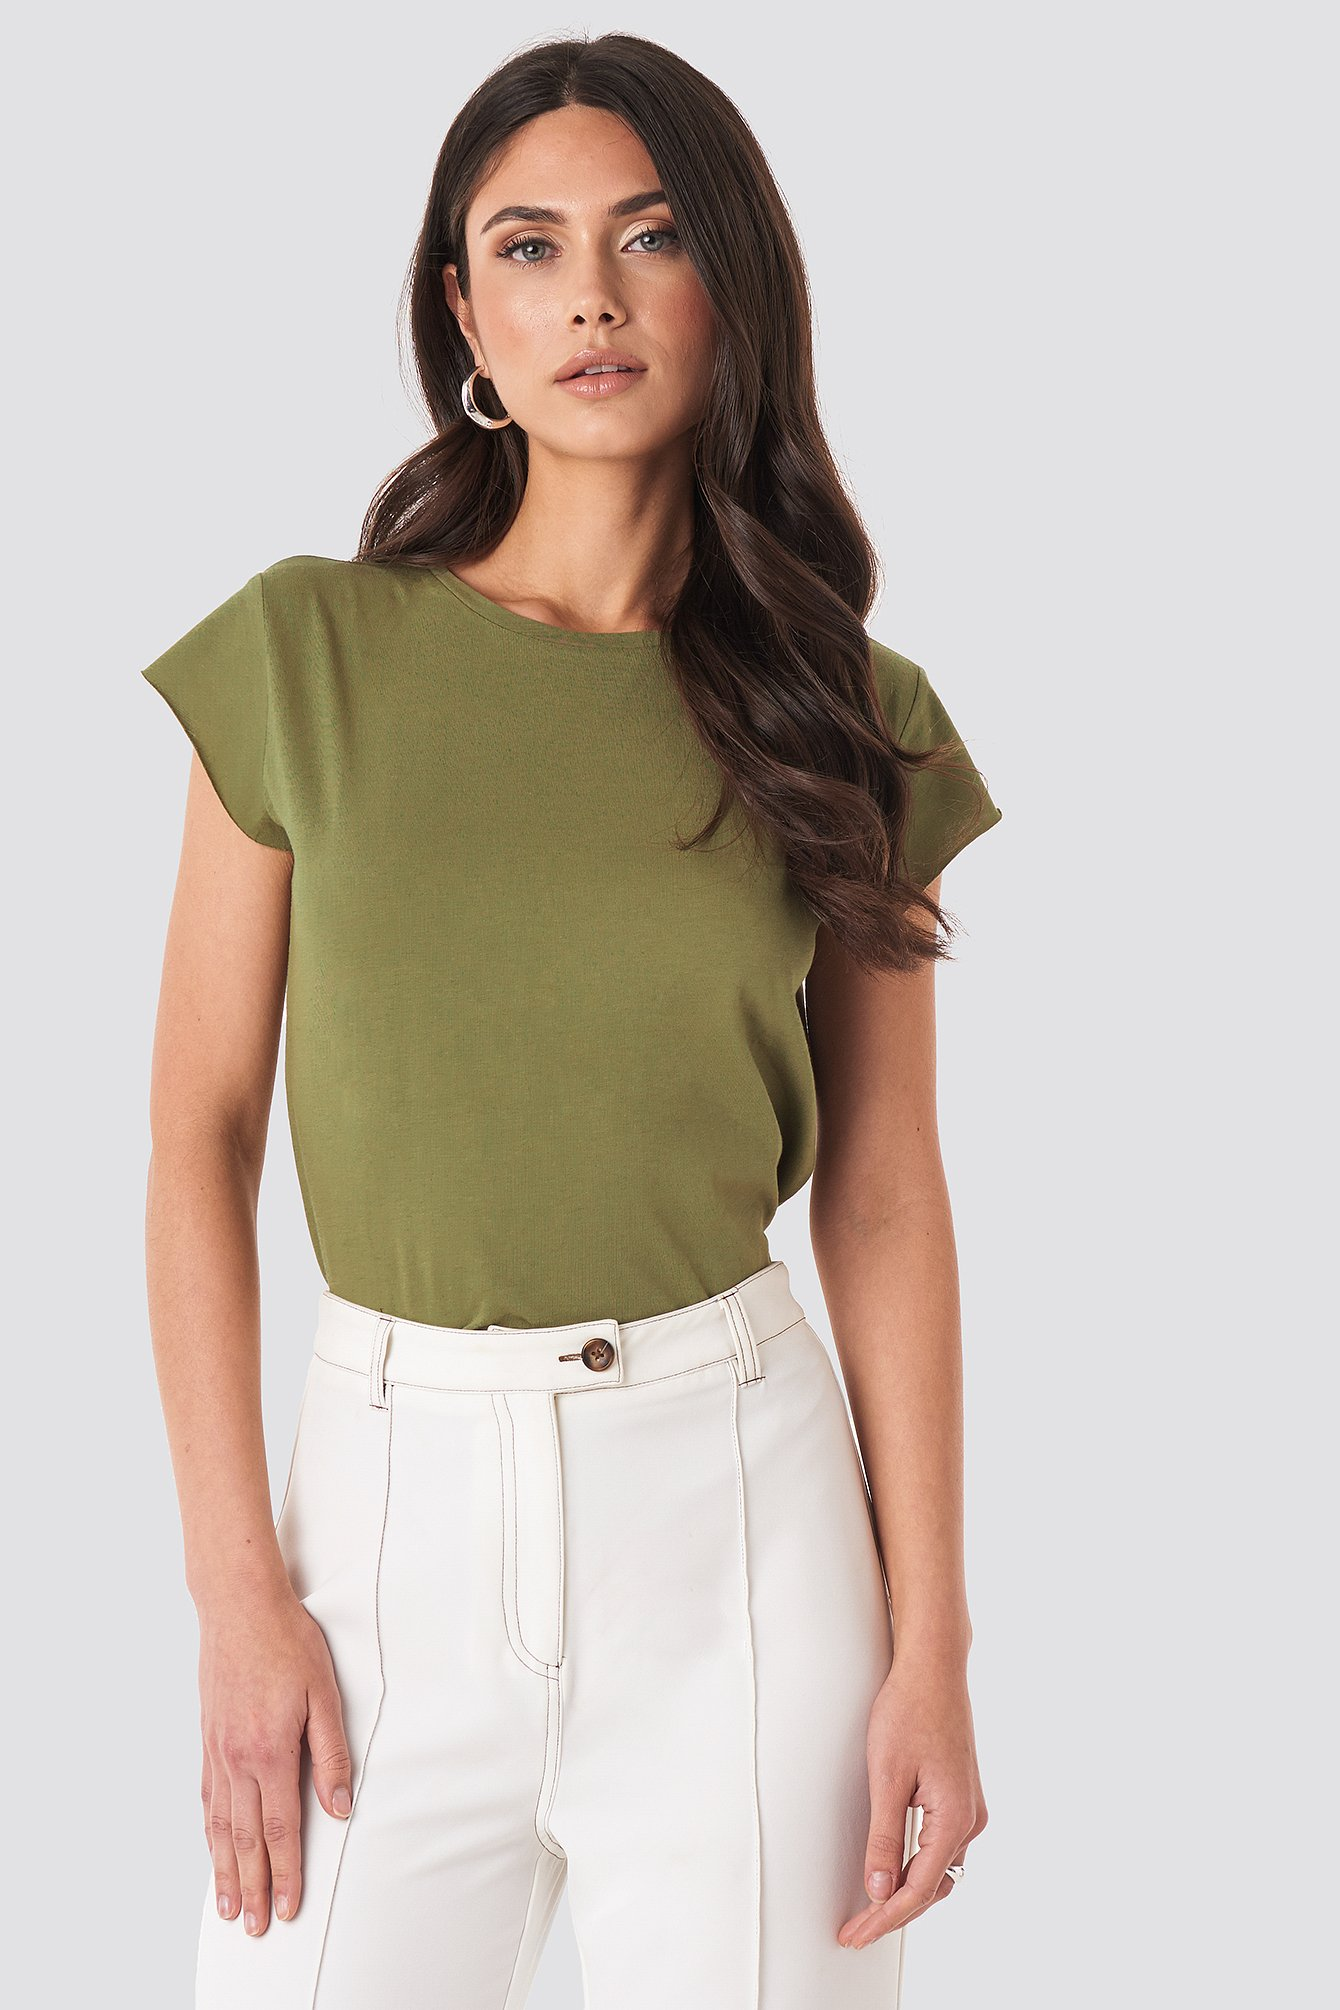 NA-KD Basic T-Shirt Mit Grobem Saum - Green | Bekleidung > Shirts > T-Shirts | NA-KD Basic